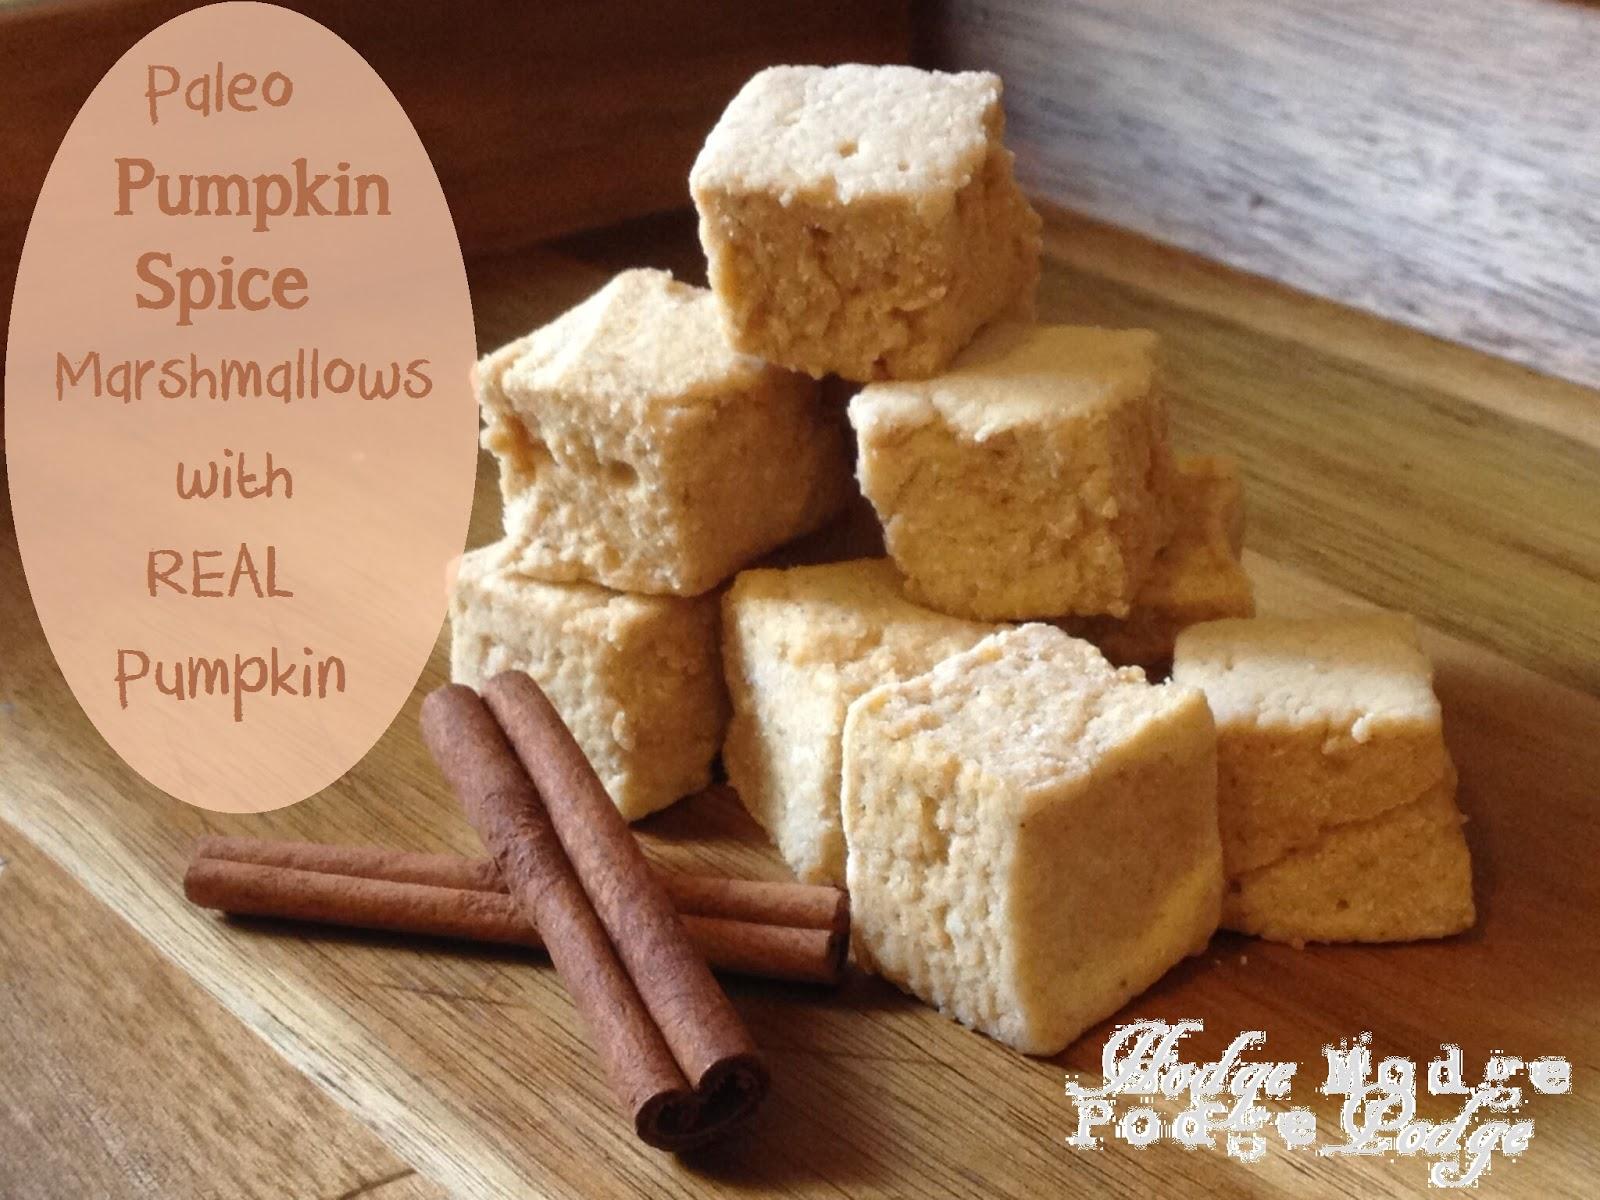 ... Podge Modge Podge: Paleo Pumpkin Spice Marshmallows w/ REAL Pumpkin